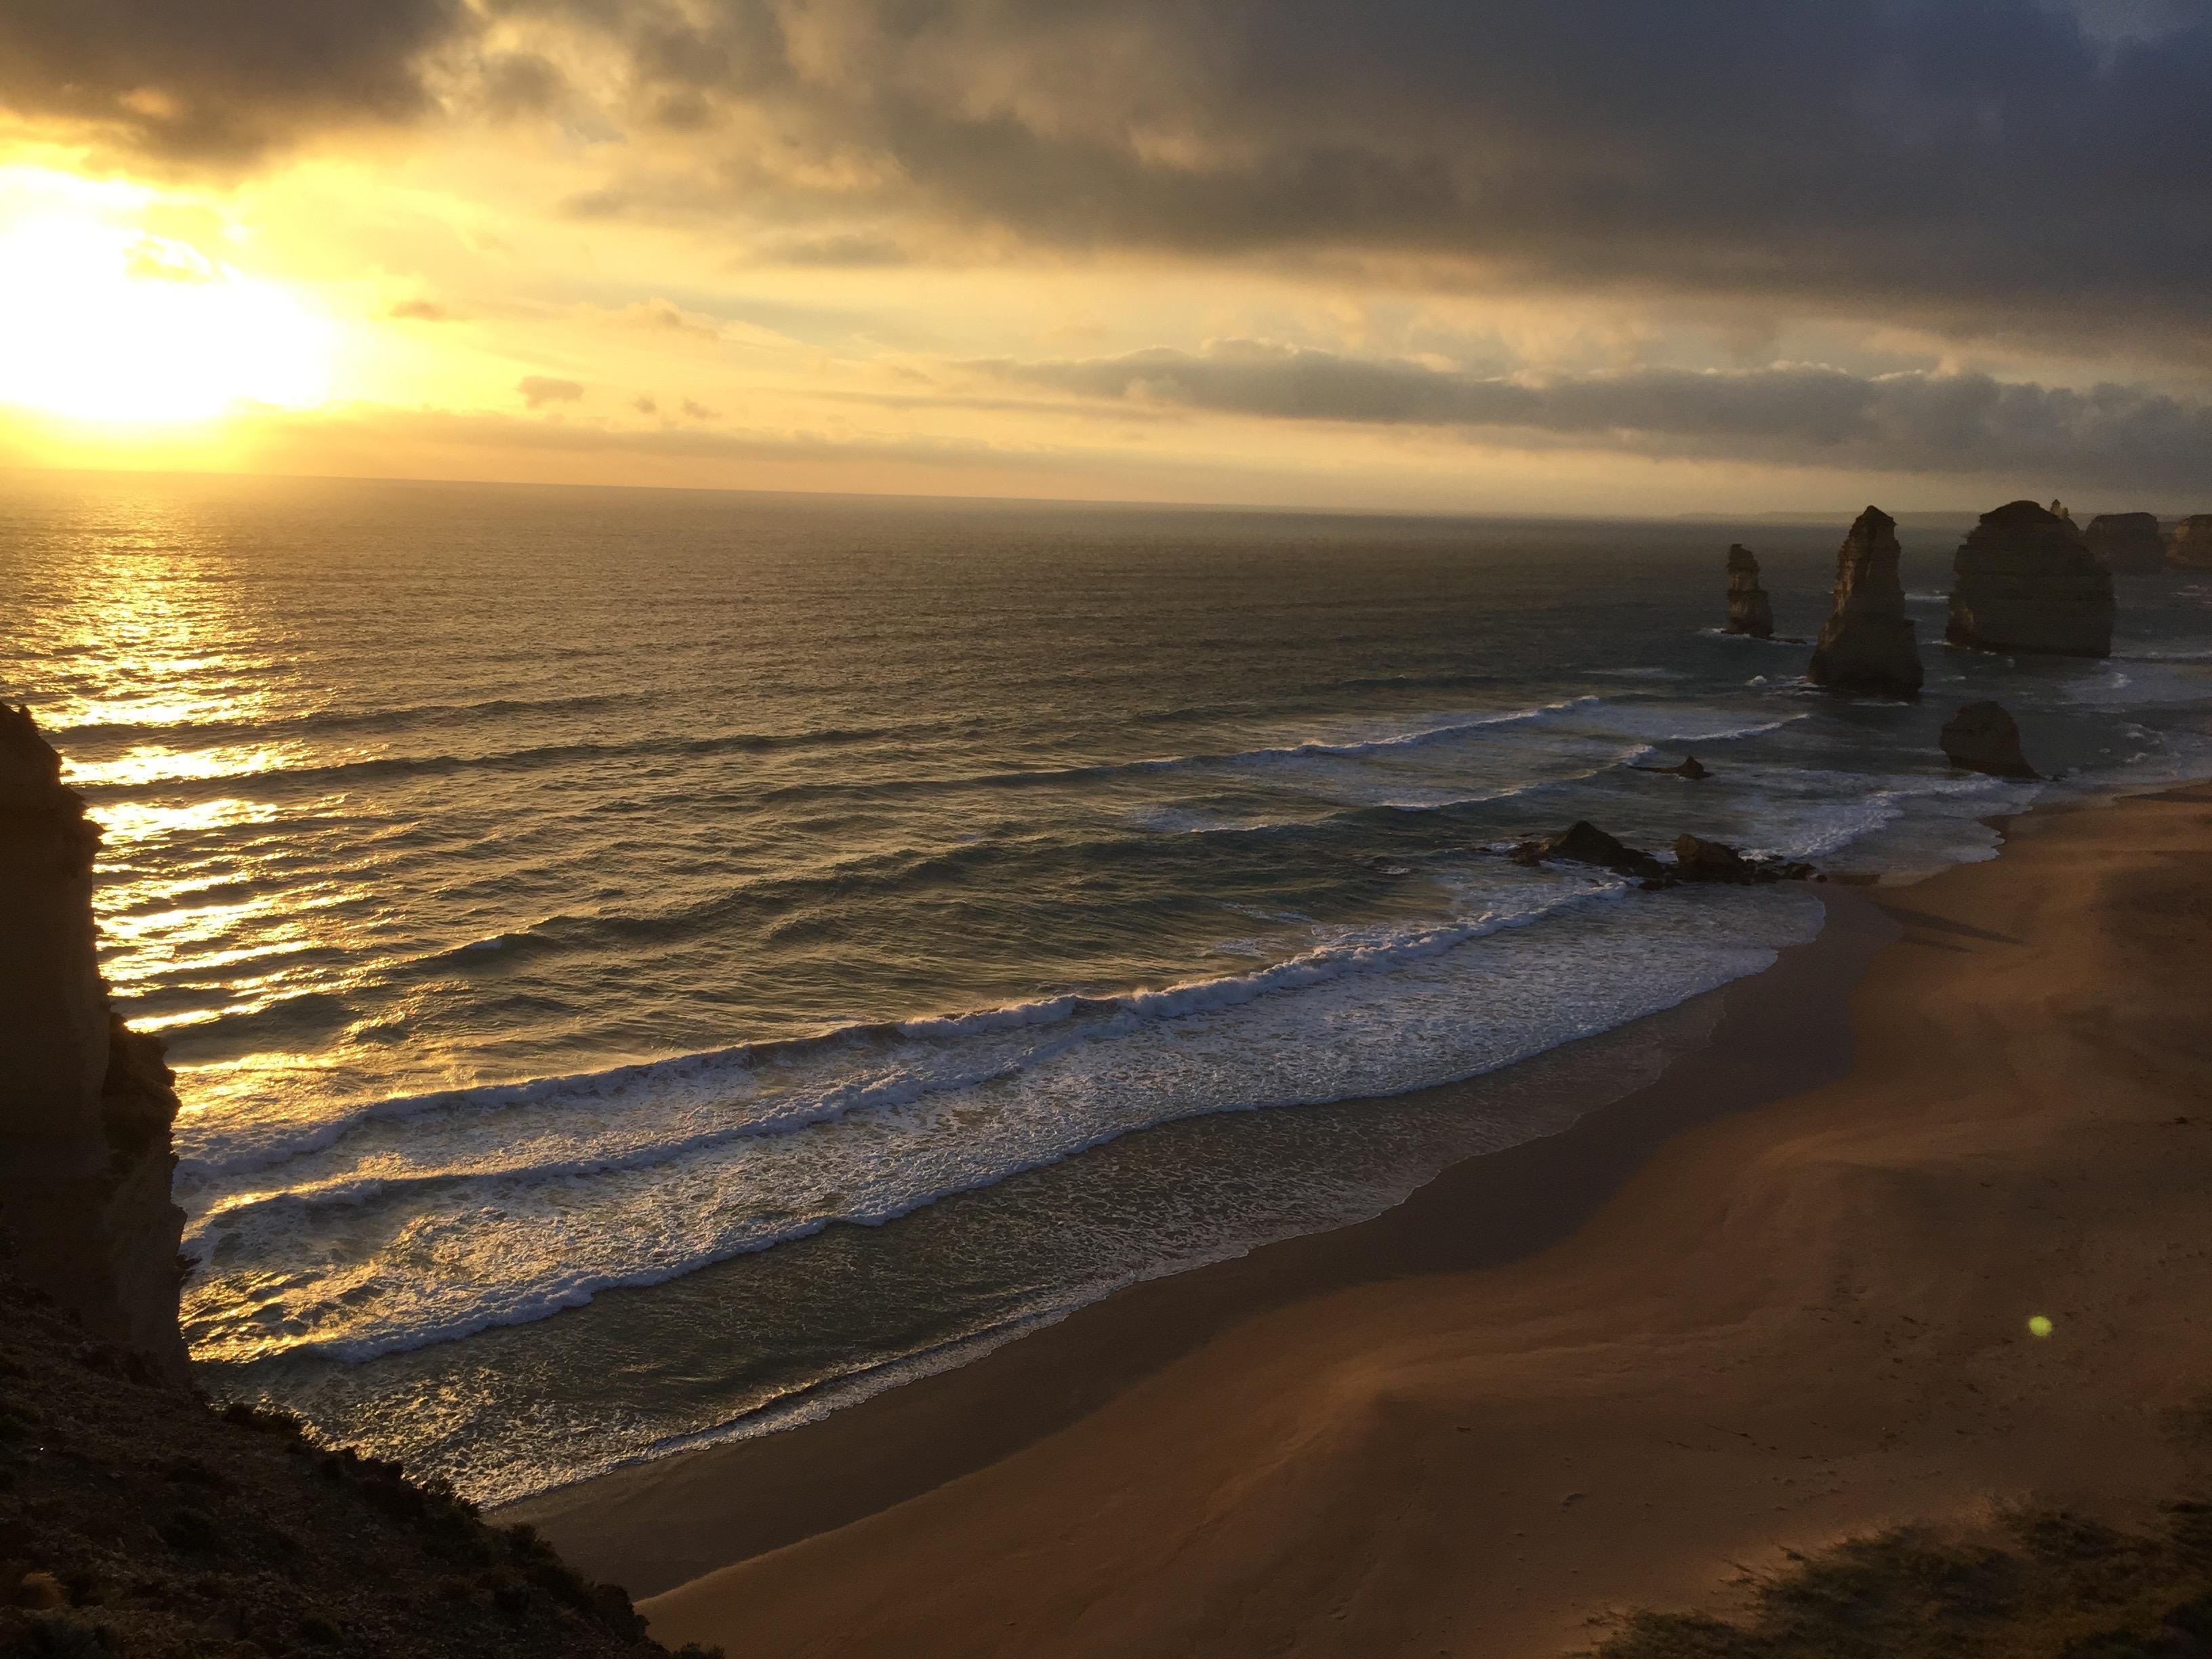 Sunset over the Twelve Apostles, south Coast of Victoria, Australia.